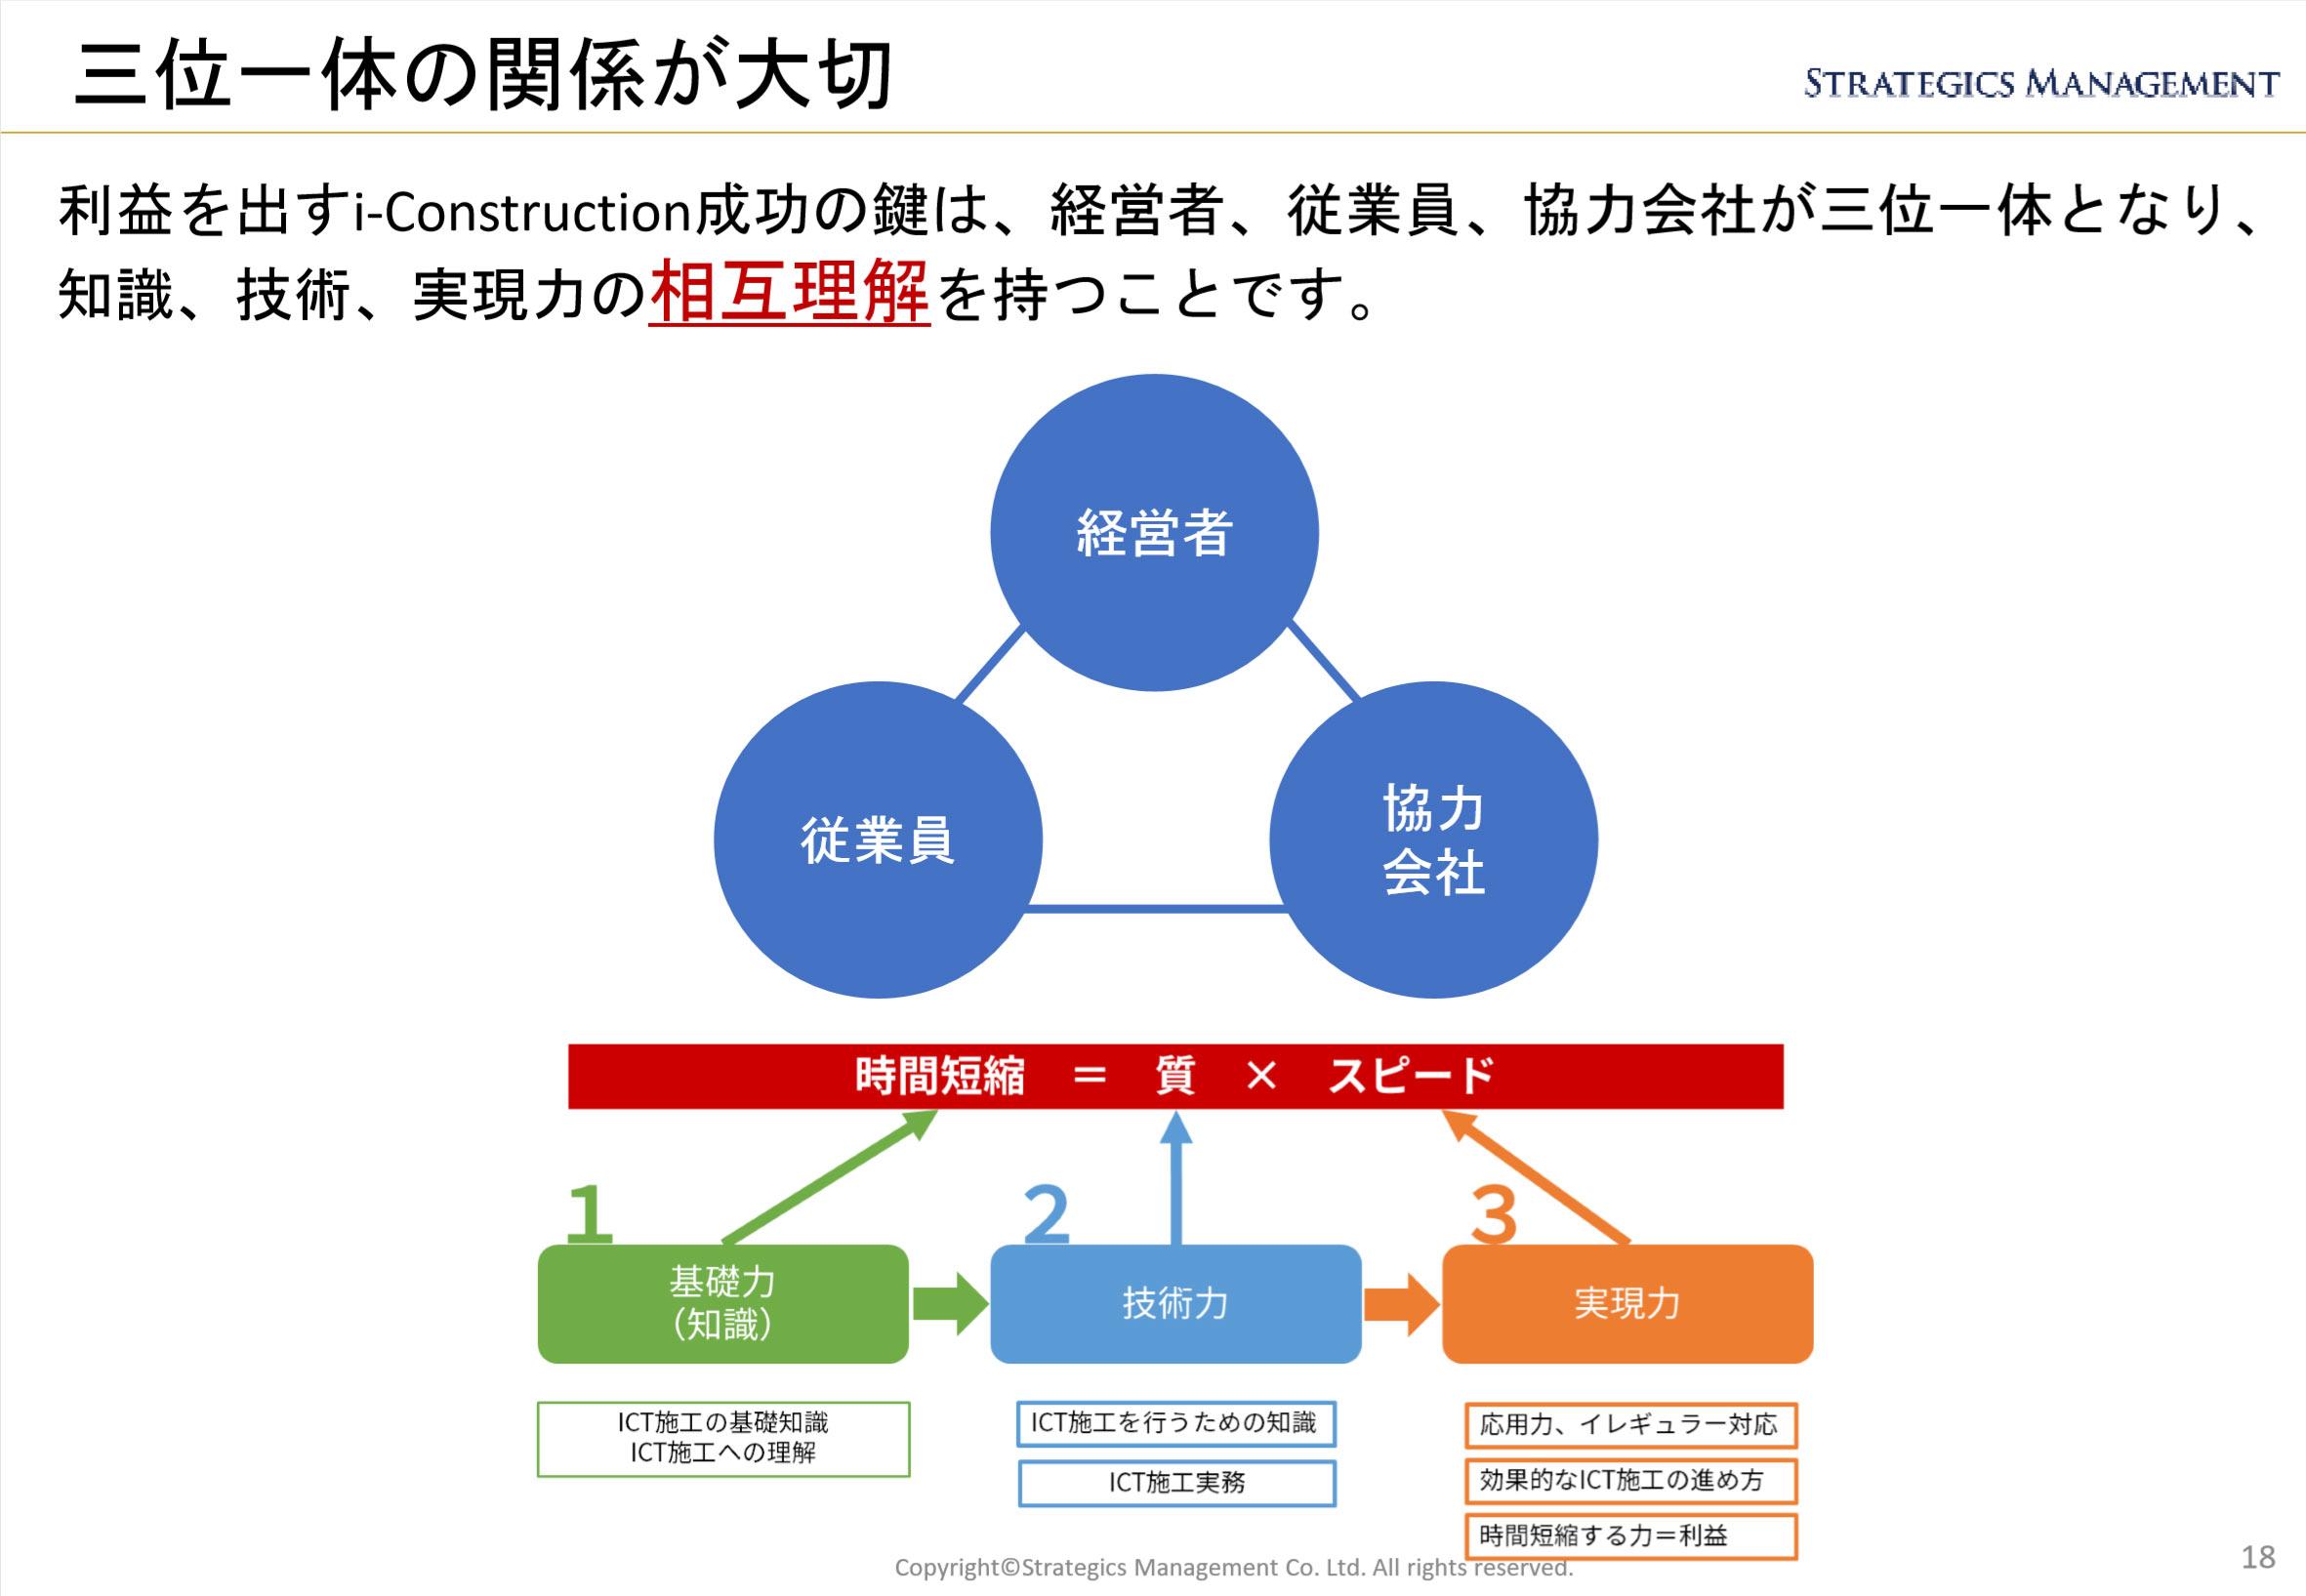 ICT施工基礎資料より抜粋した三位一体を表す図